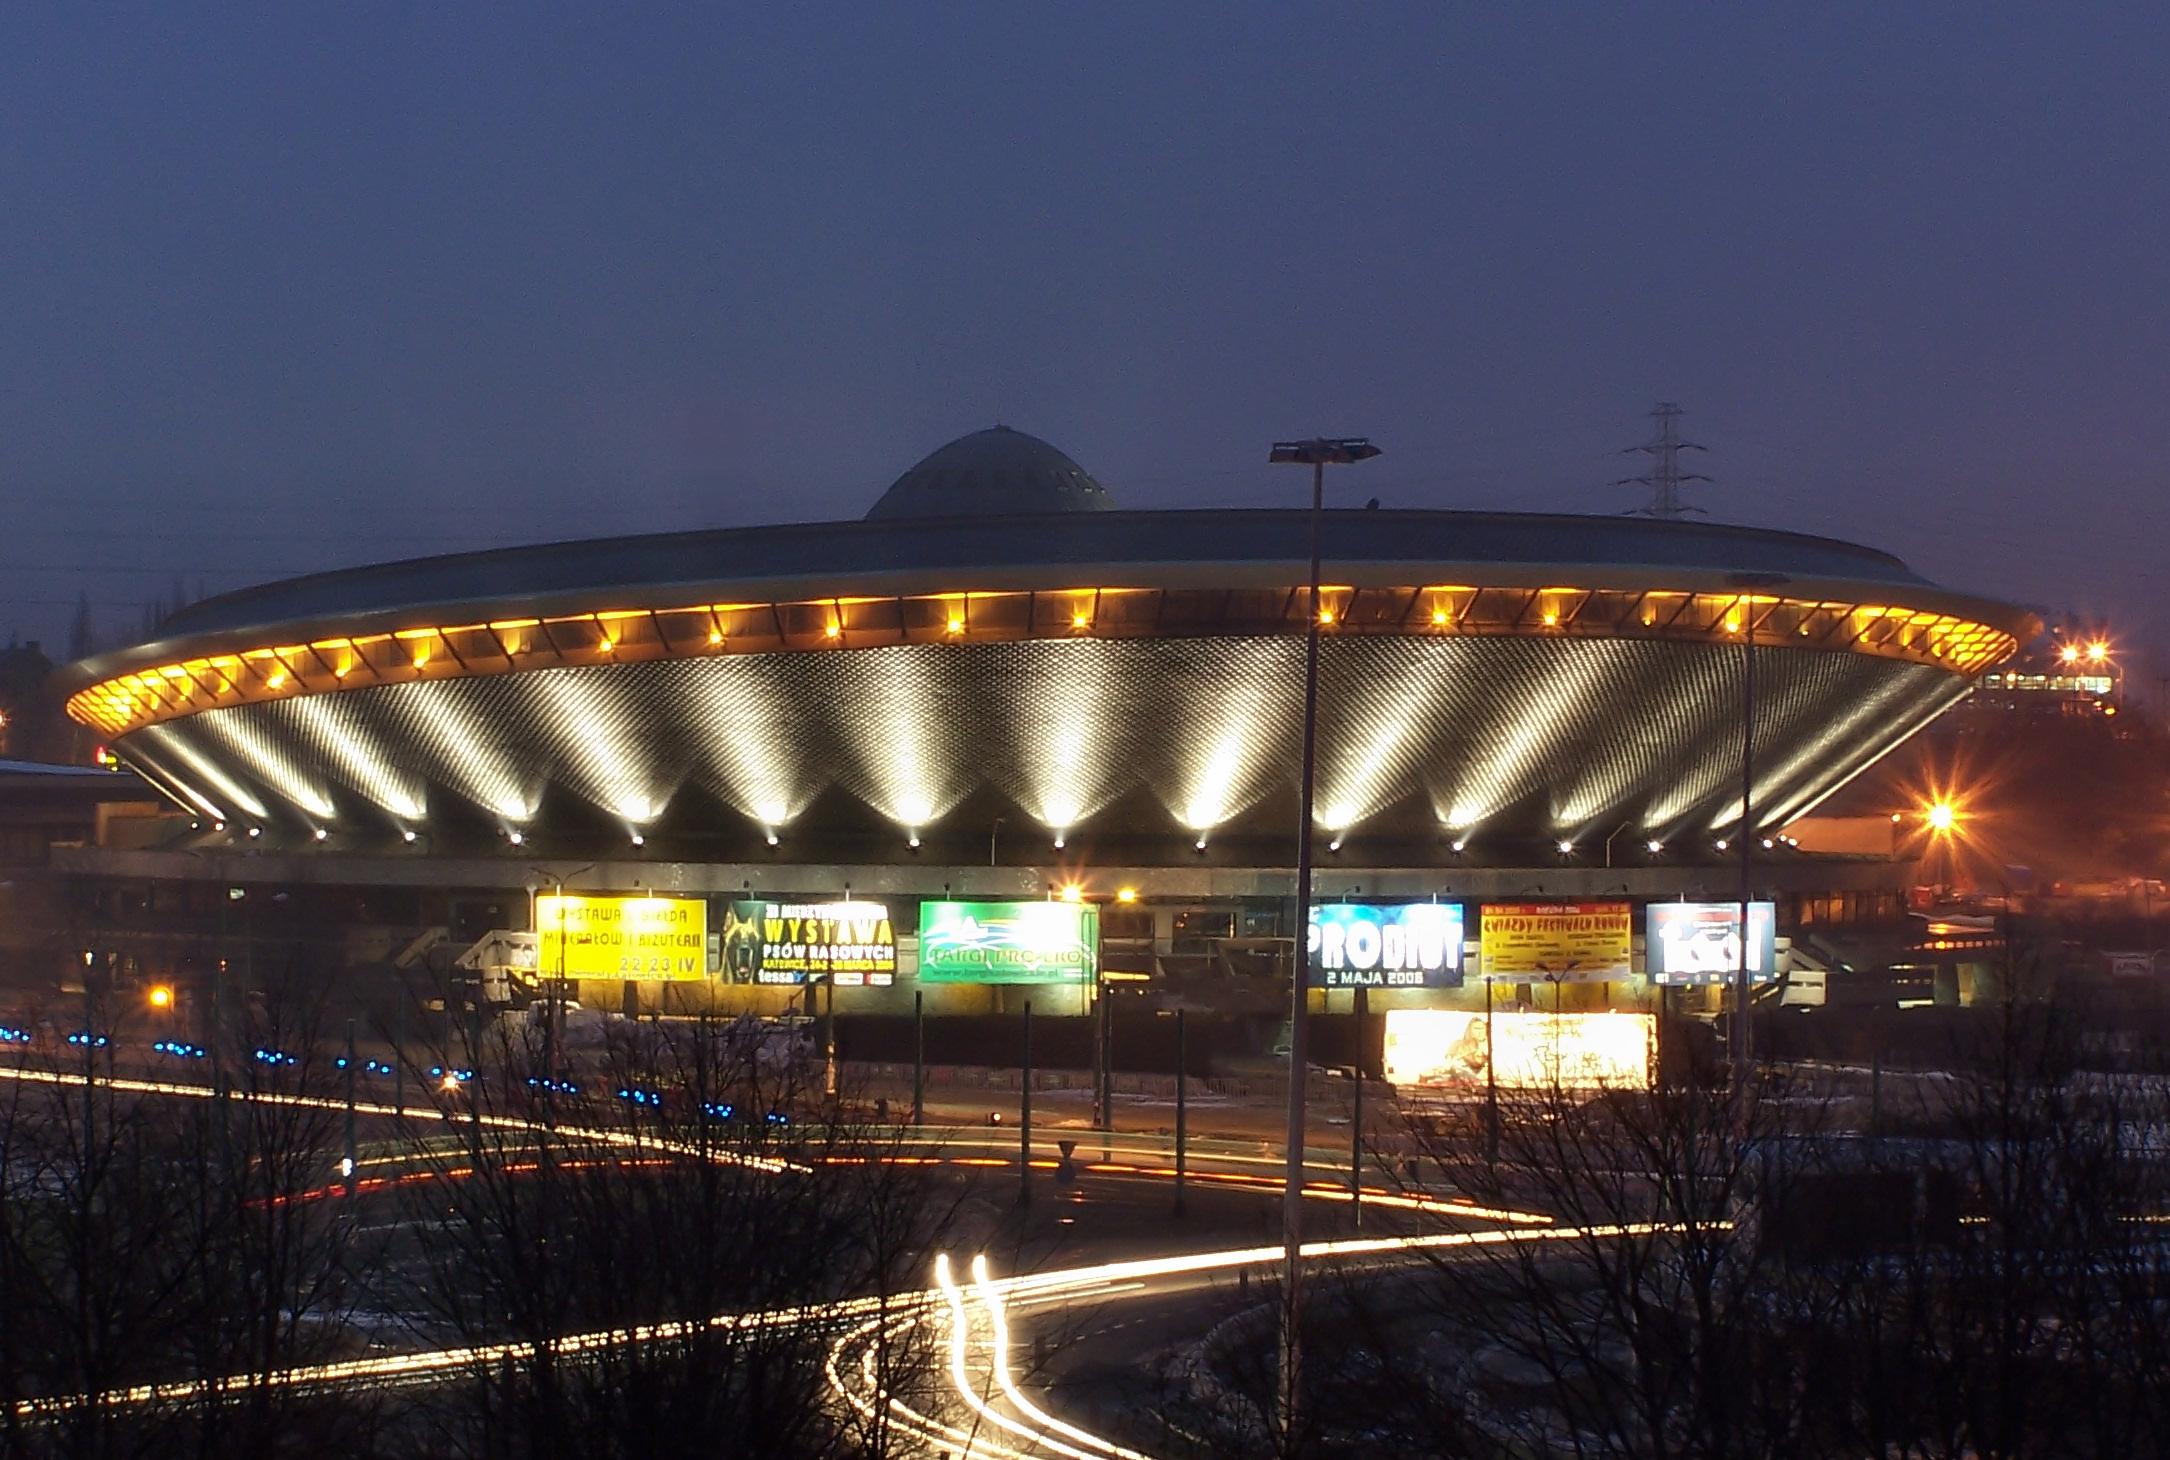 Veranstaltungshalle Spodek in Katowice, Polen; Foto: Wikimedia Commons, Jan Mehlich